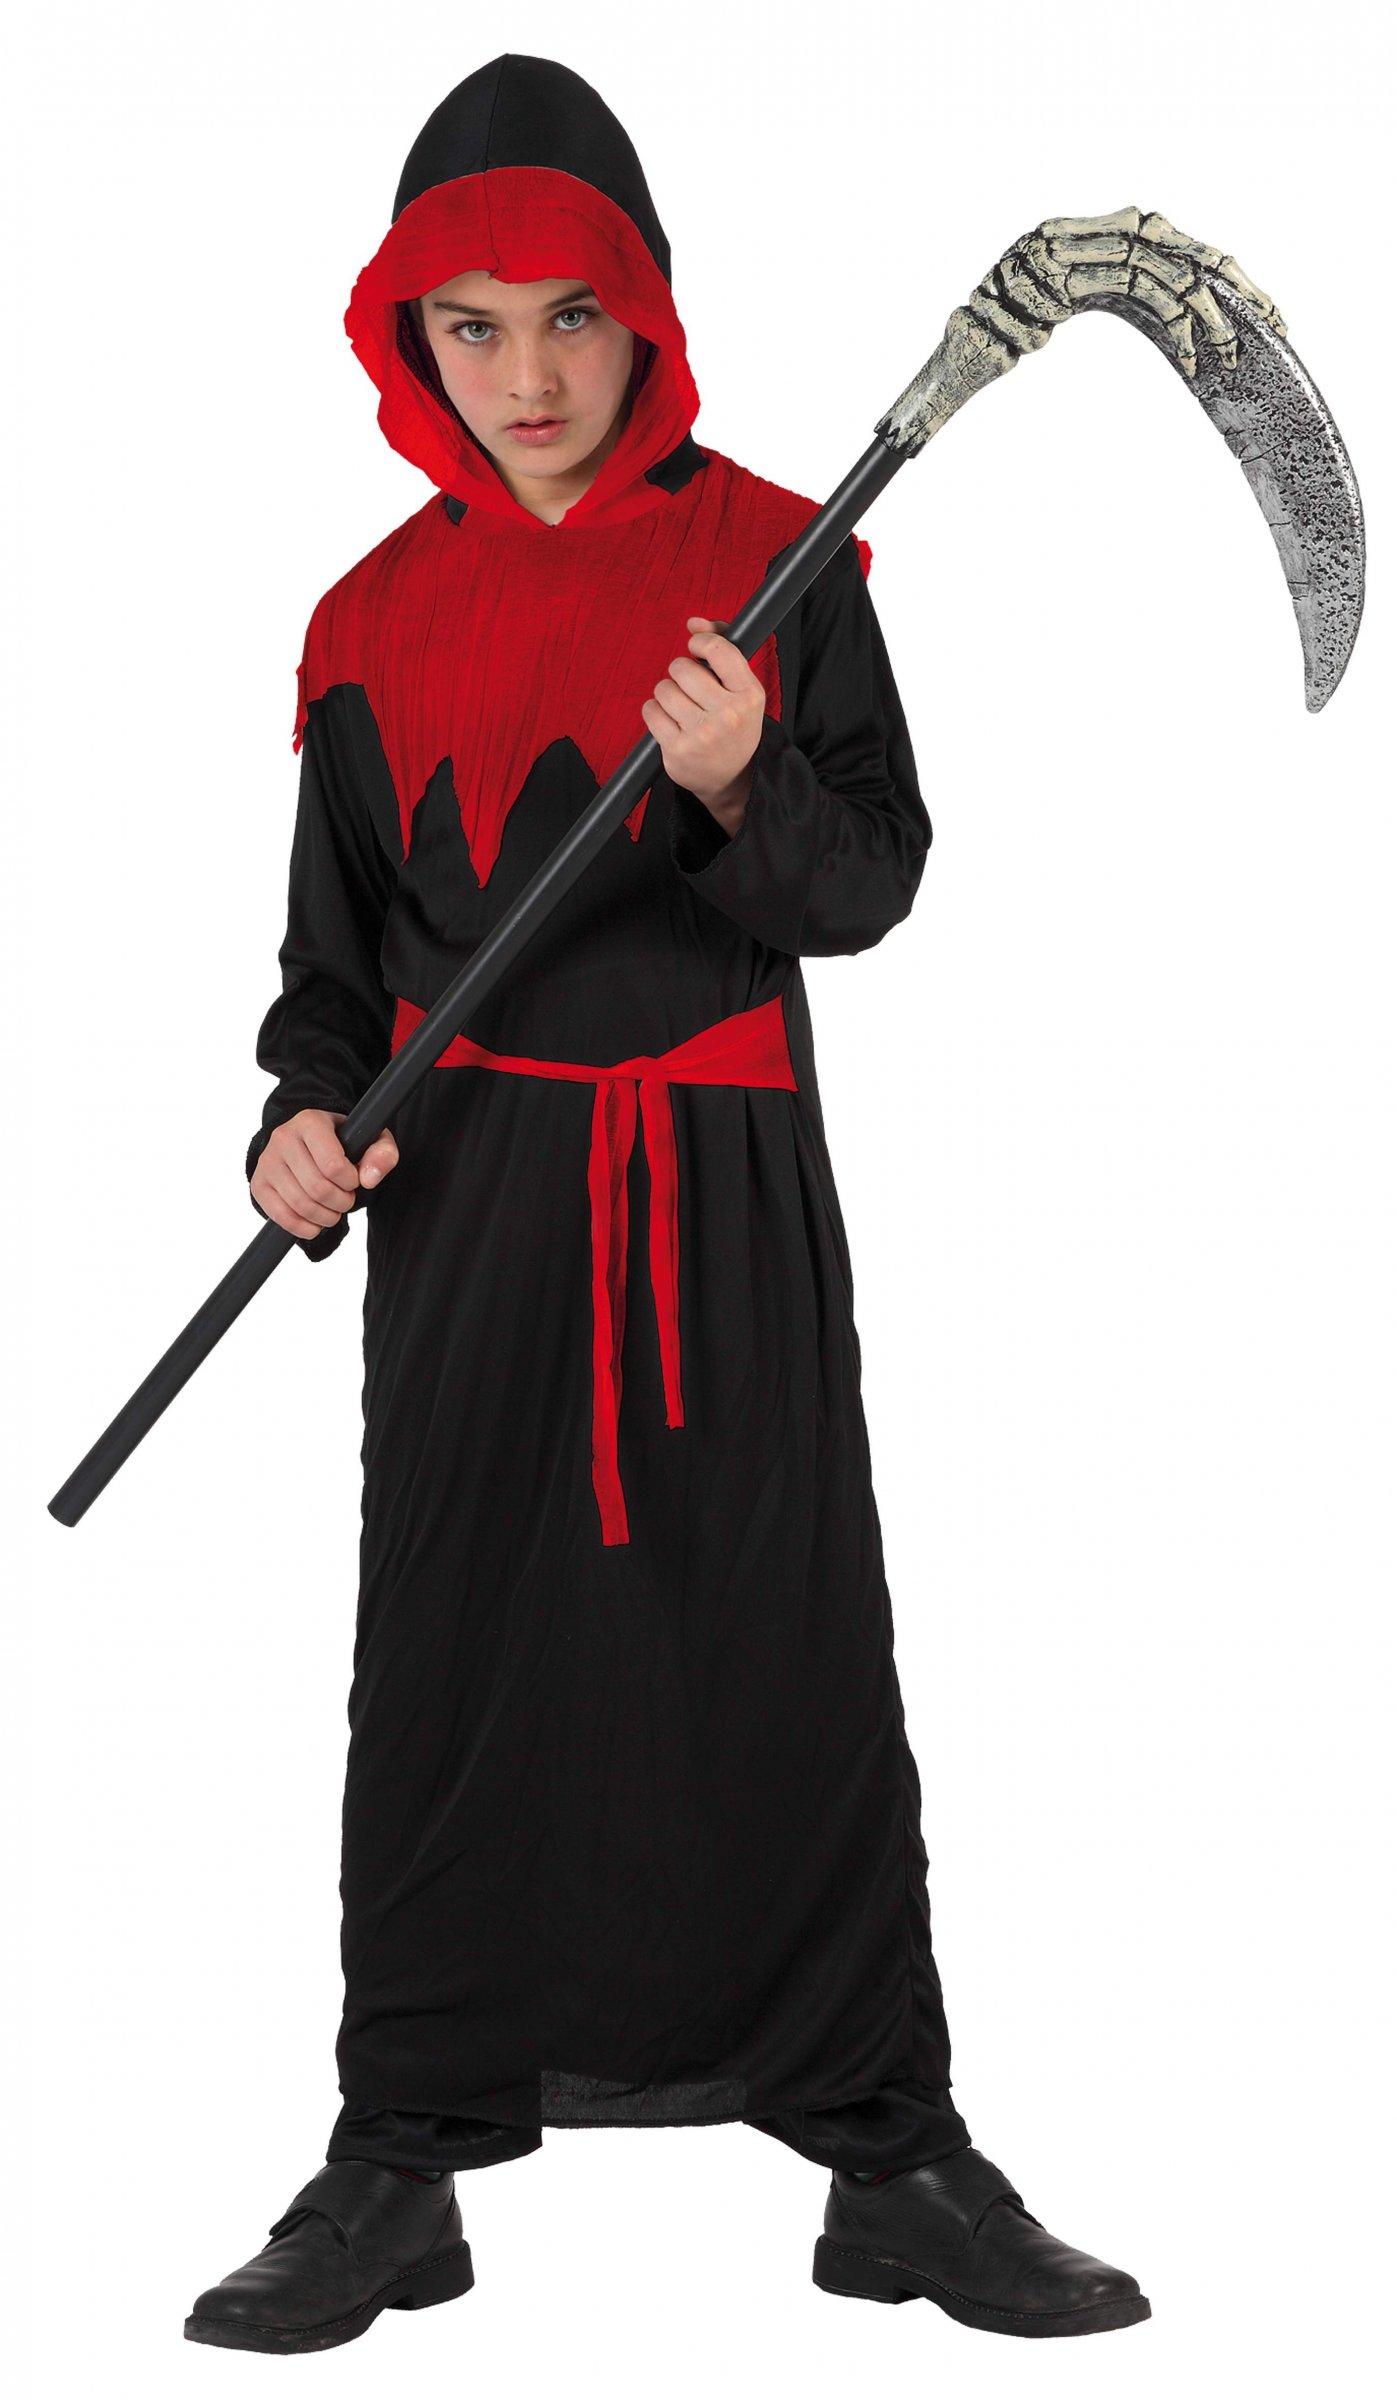 p sensenmann halloween kostum fur kinder